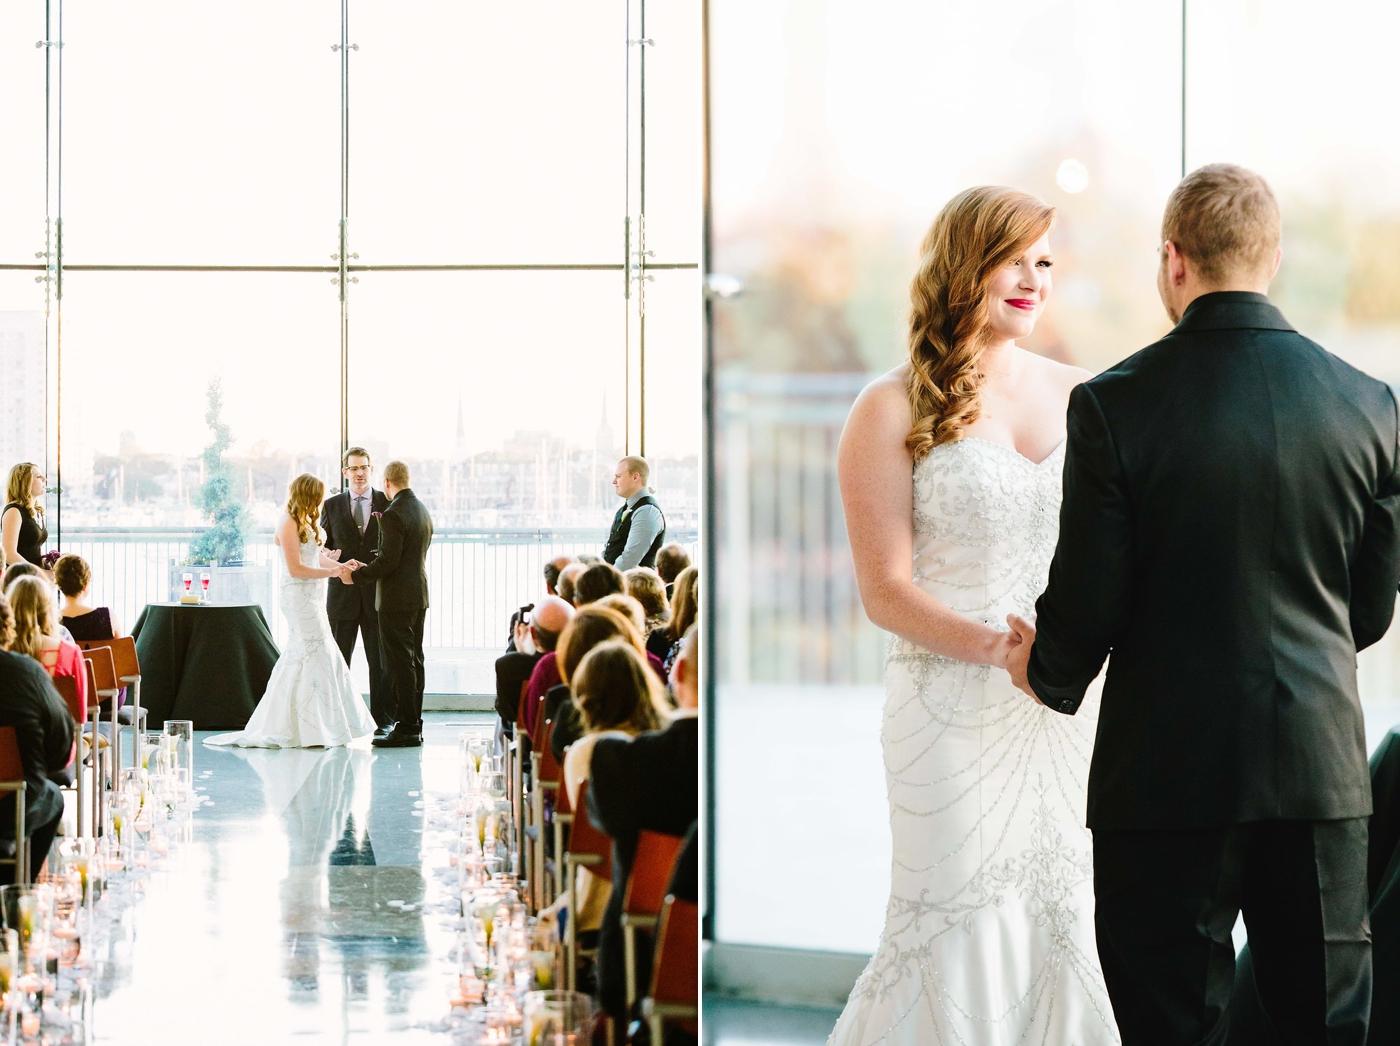 chicago-fine-art-wedding-photography-burnette18